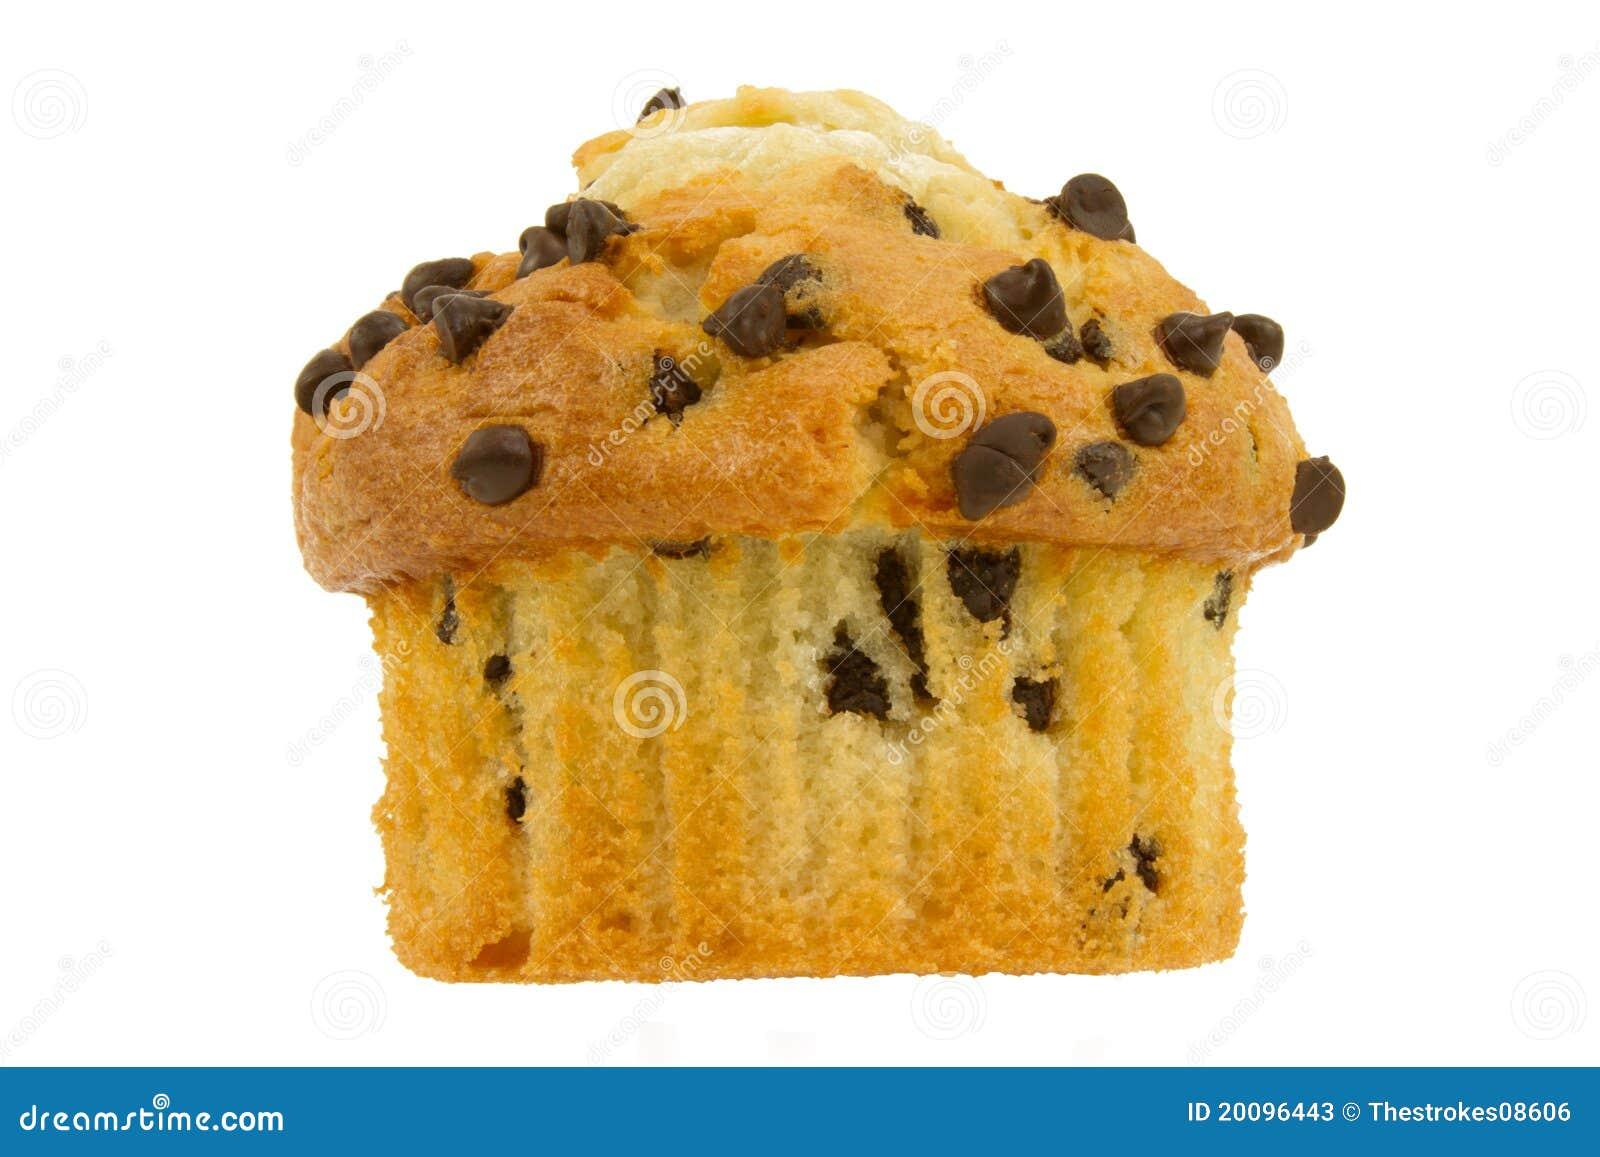 chocolate-chip-muffin-white-background-2